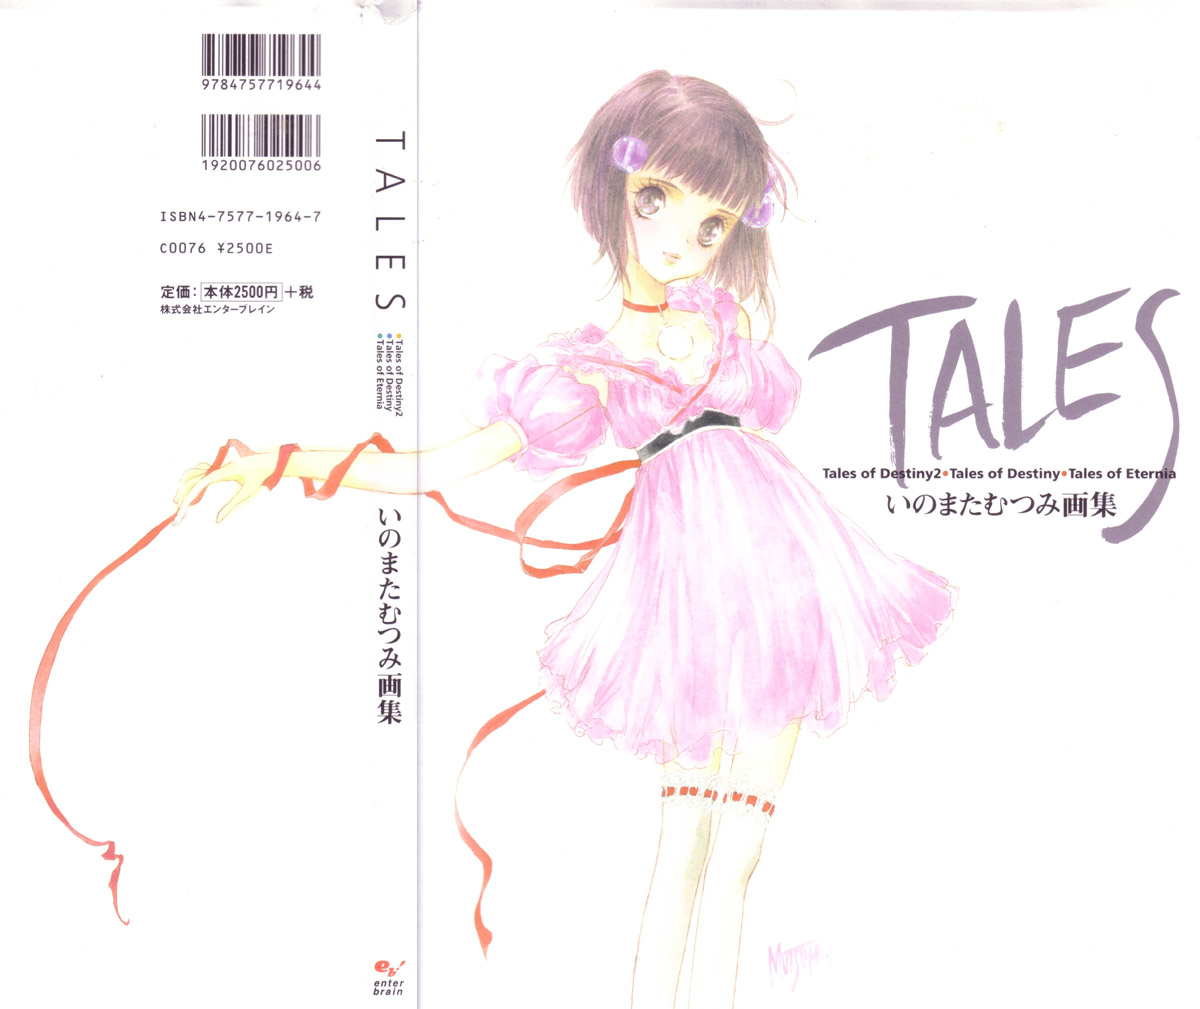 Tales image by Inomata Mutsumi